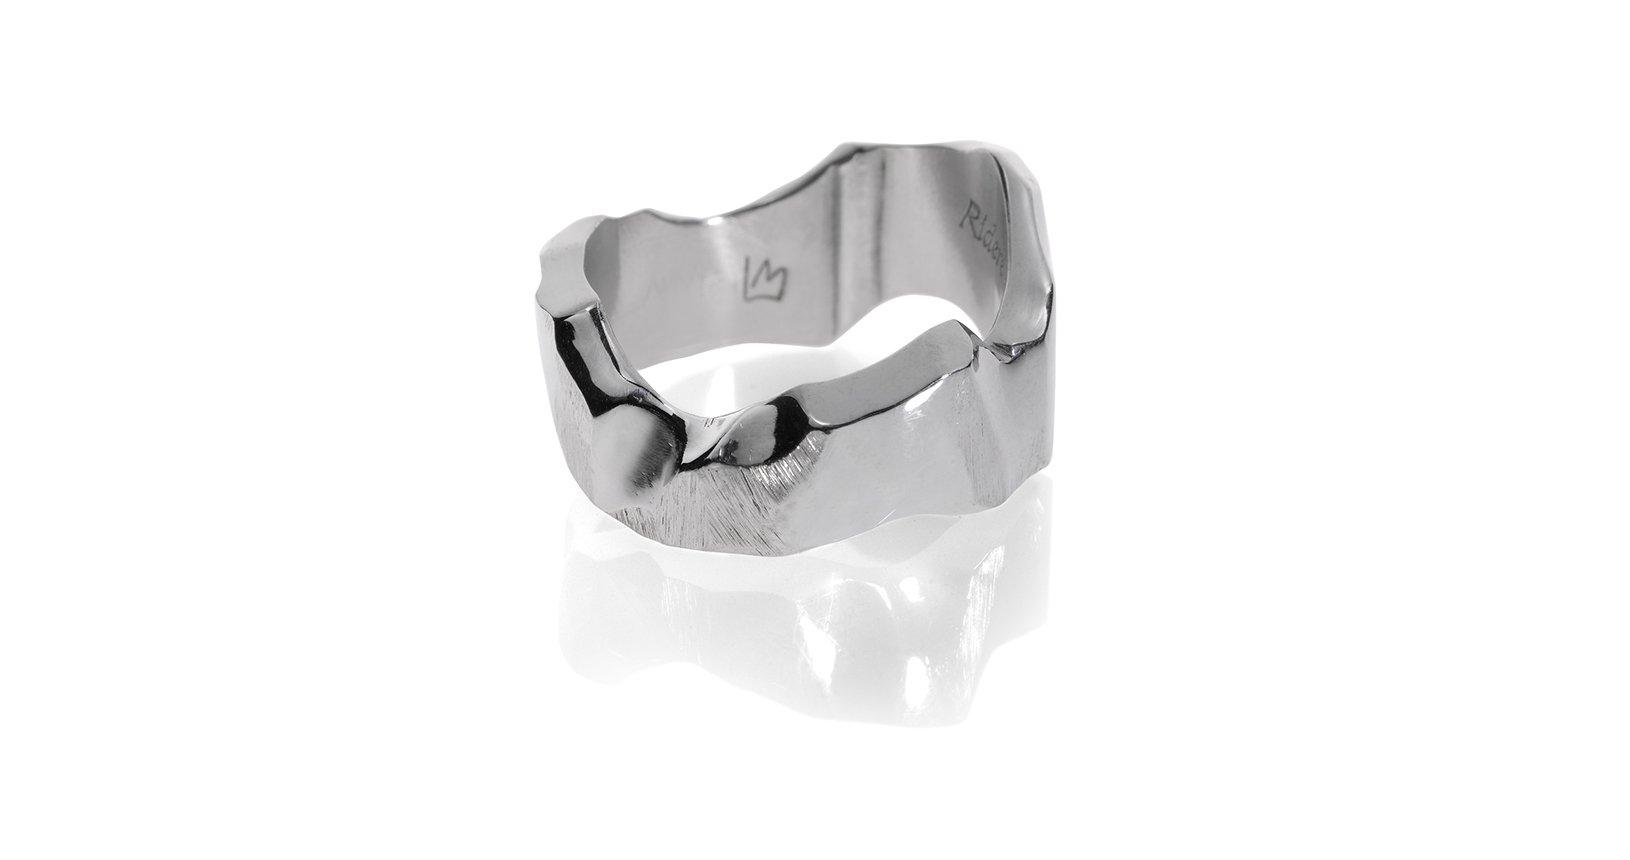 Stone-anello intitanio